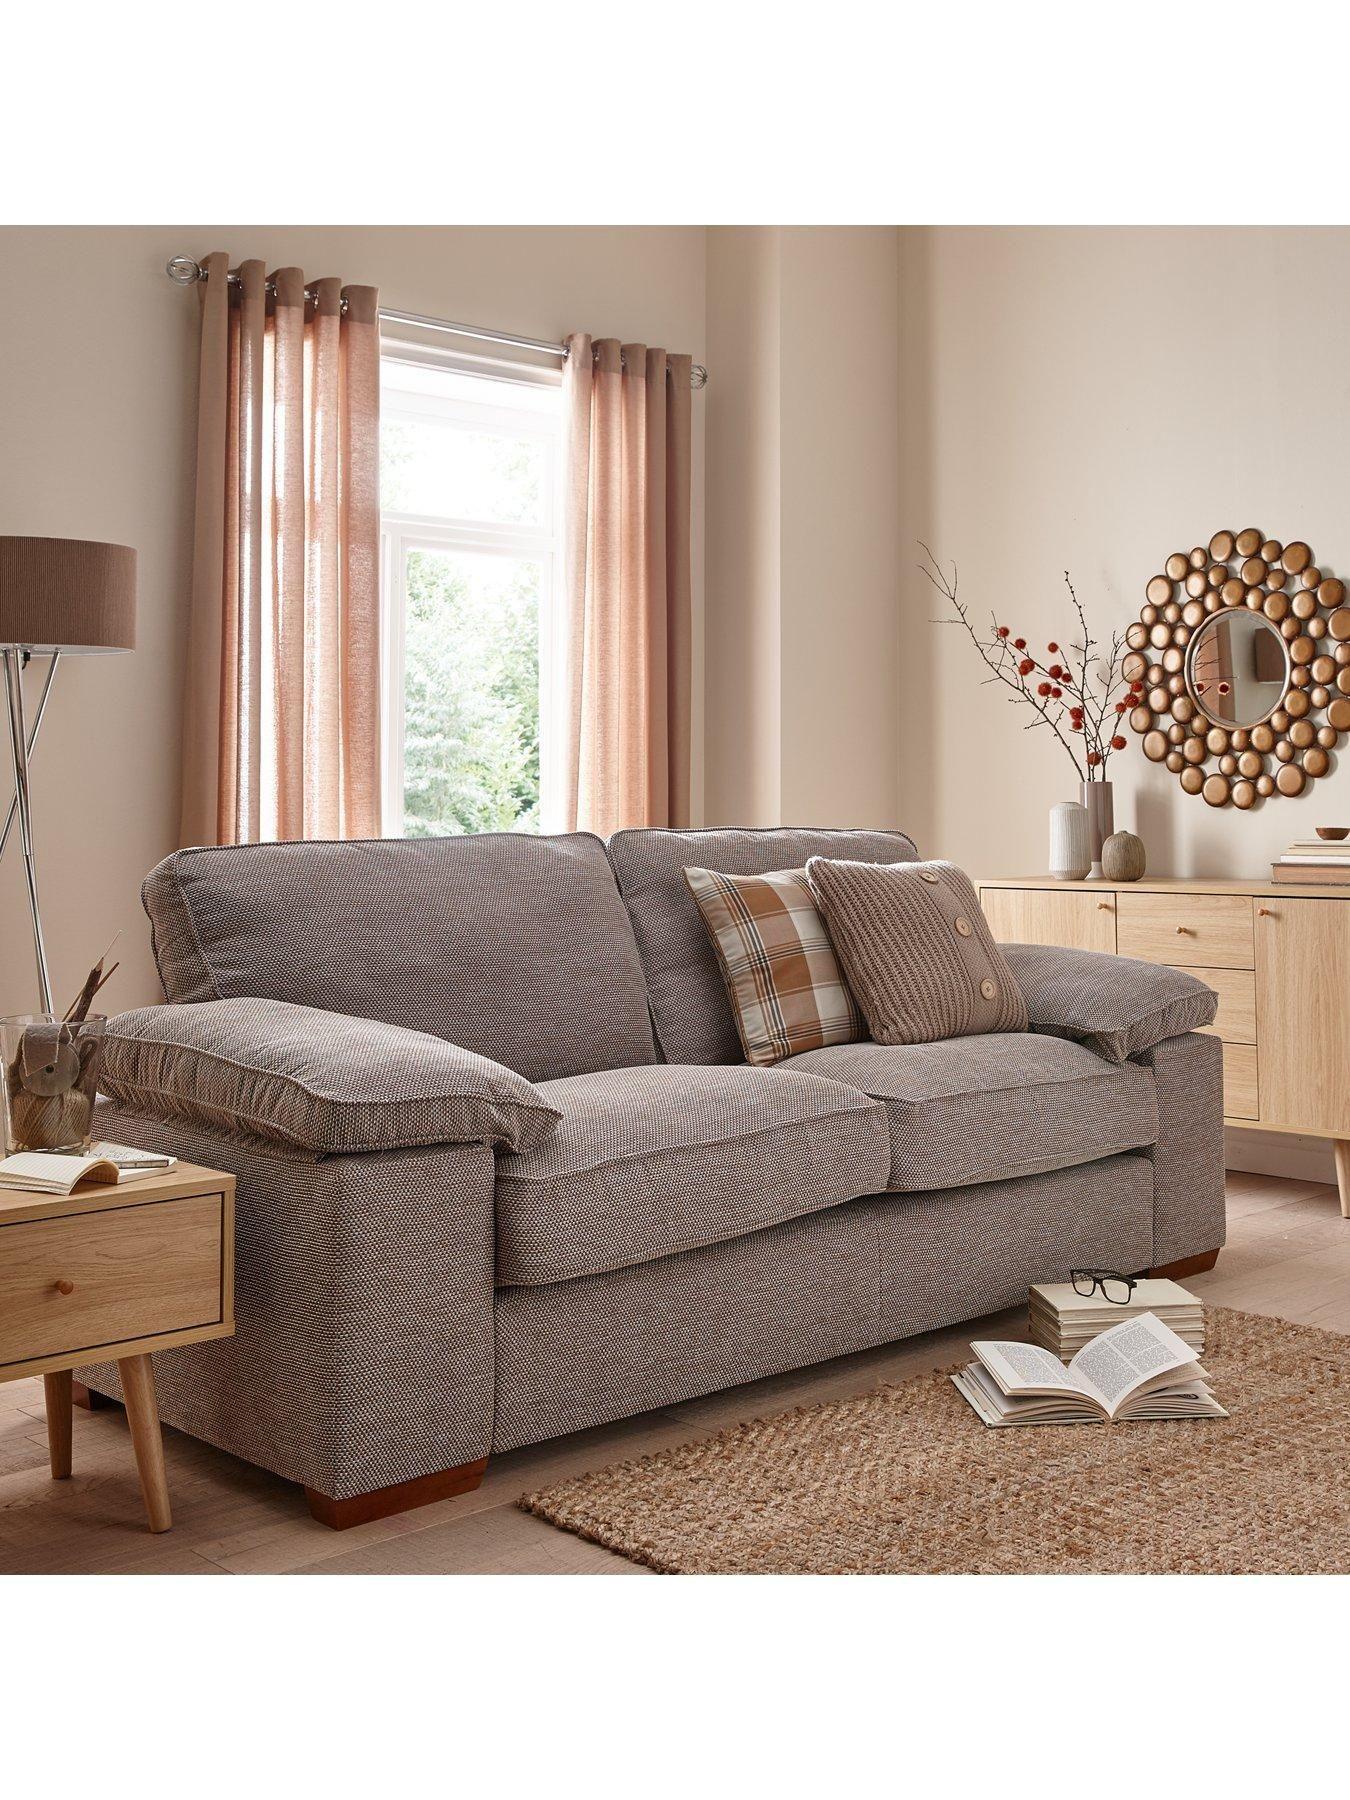 Magnificent Aylesbury 3 Seater 2 Seater Fabric Sofa Set Buy And Save Uwap Interior Chair Design Uwaporg